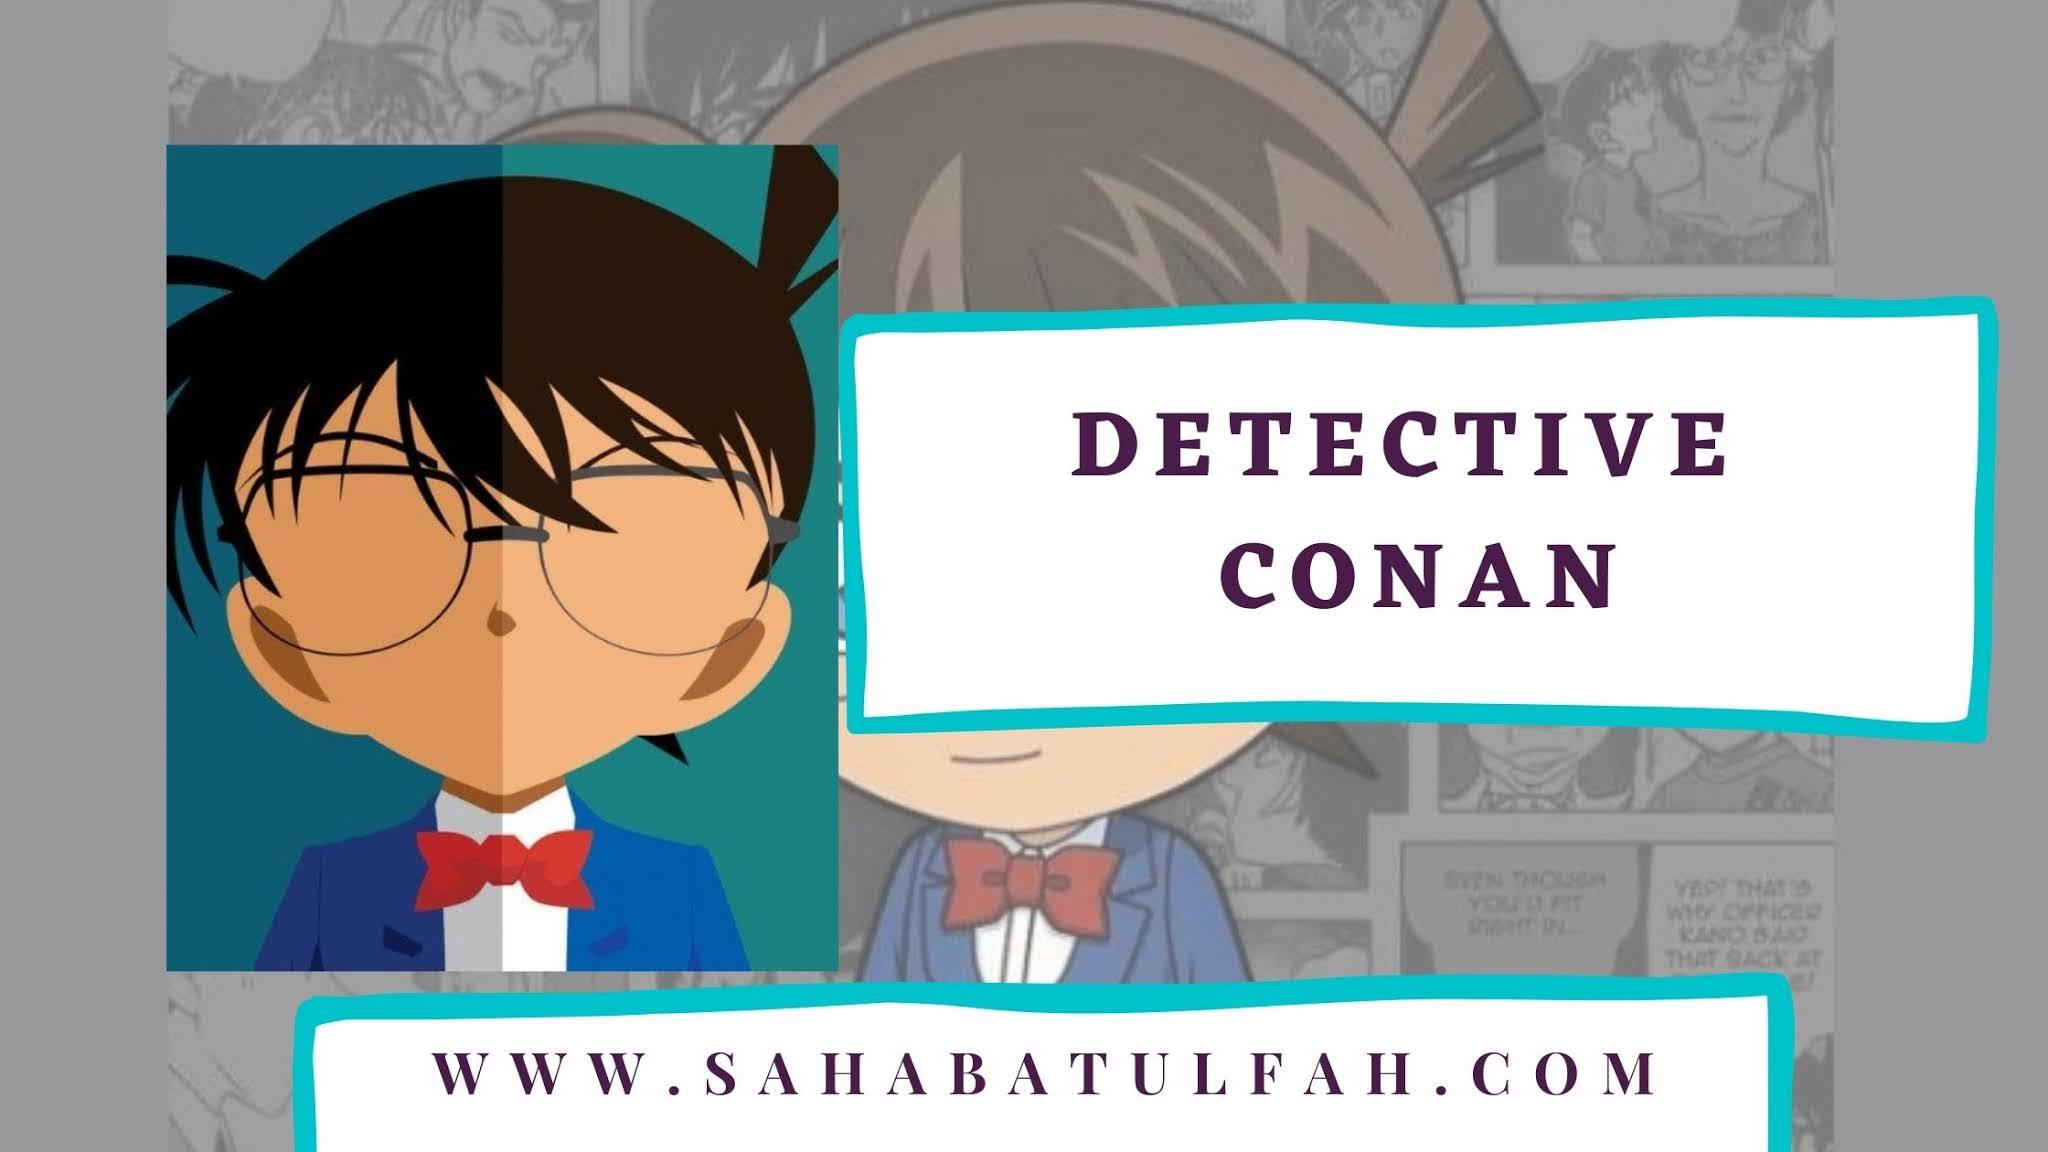 Komik-yang-Detective-Conan-Dengan-Penuh-Kisah-Misteri